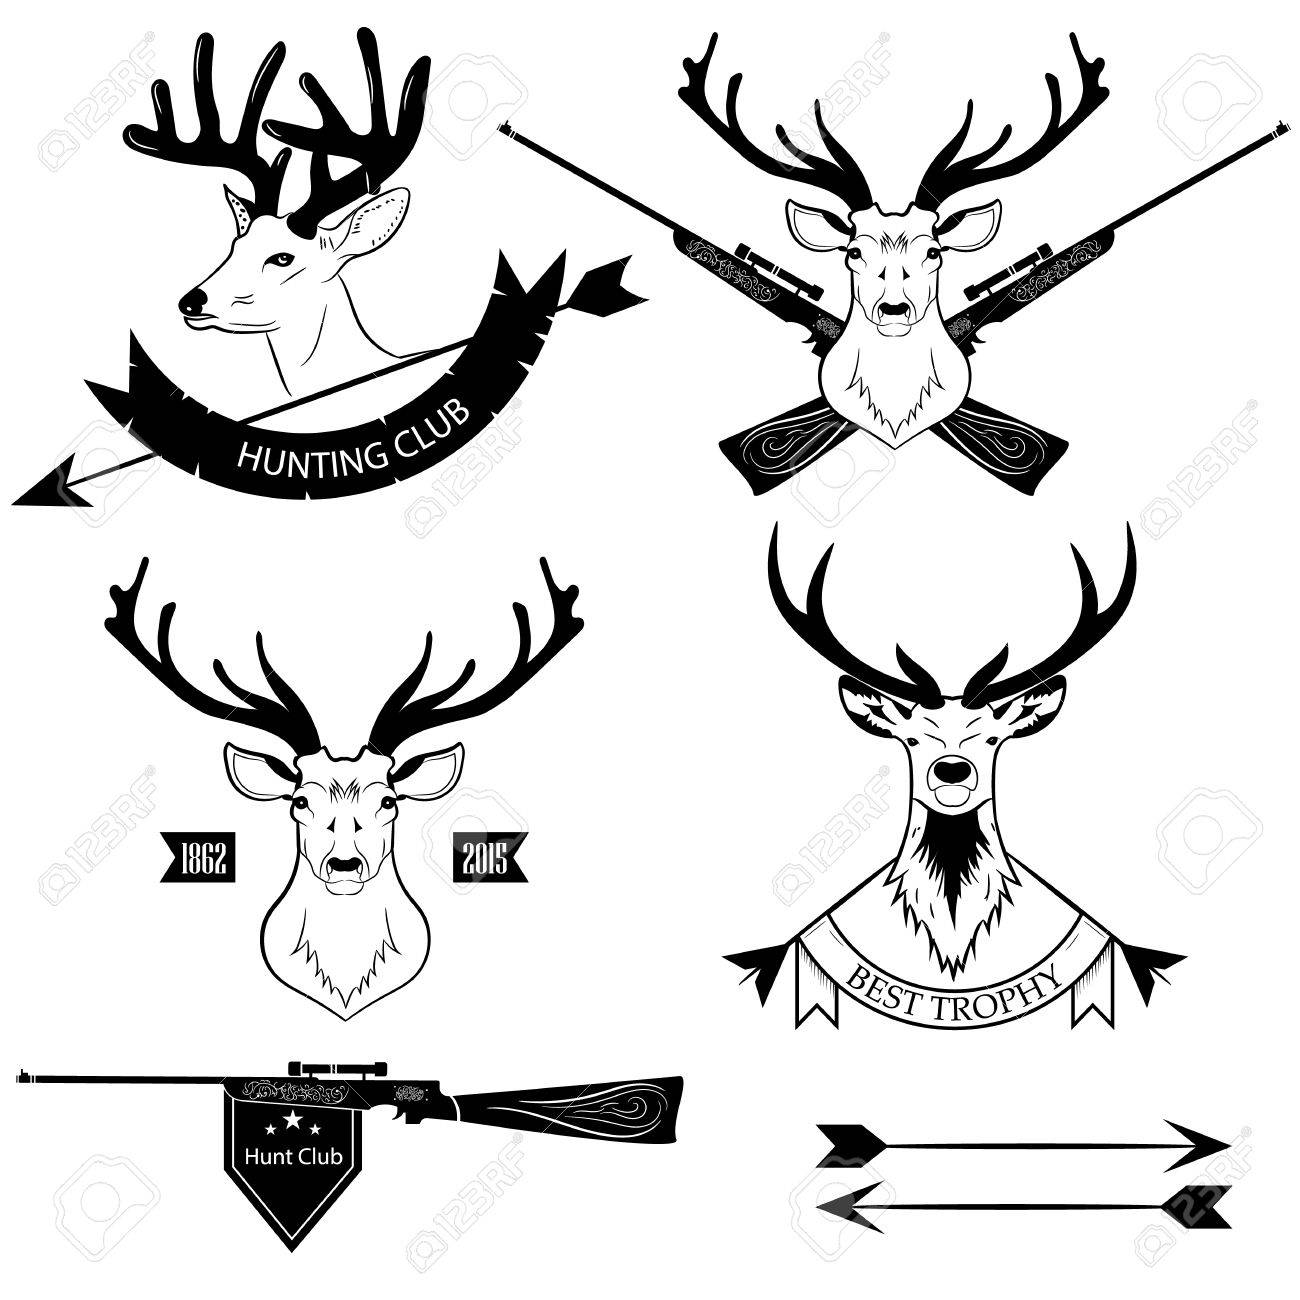 logos hunting clubs deer royalty free cliparts vectors and stock rh 123rf com deer logo shirts deer logistics